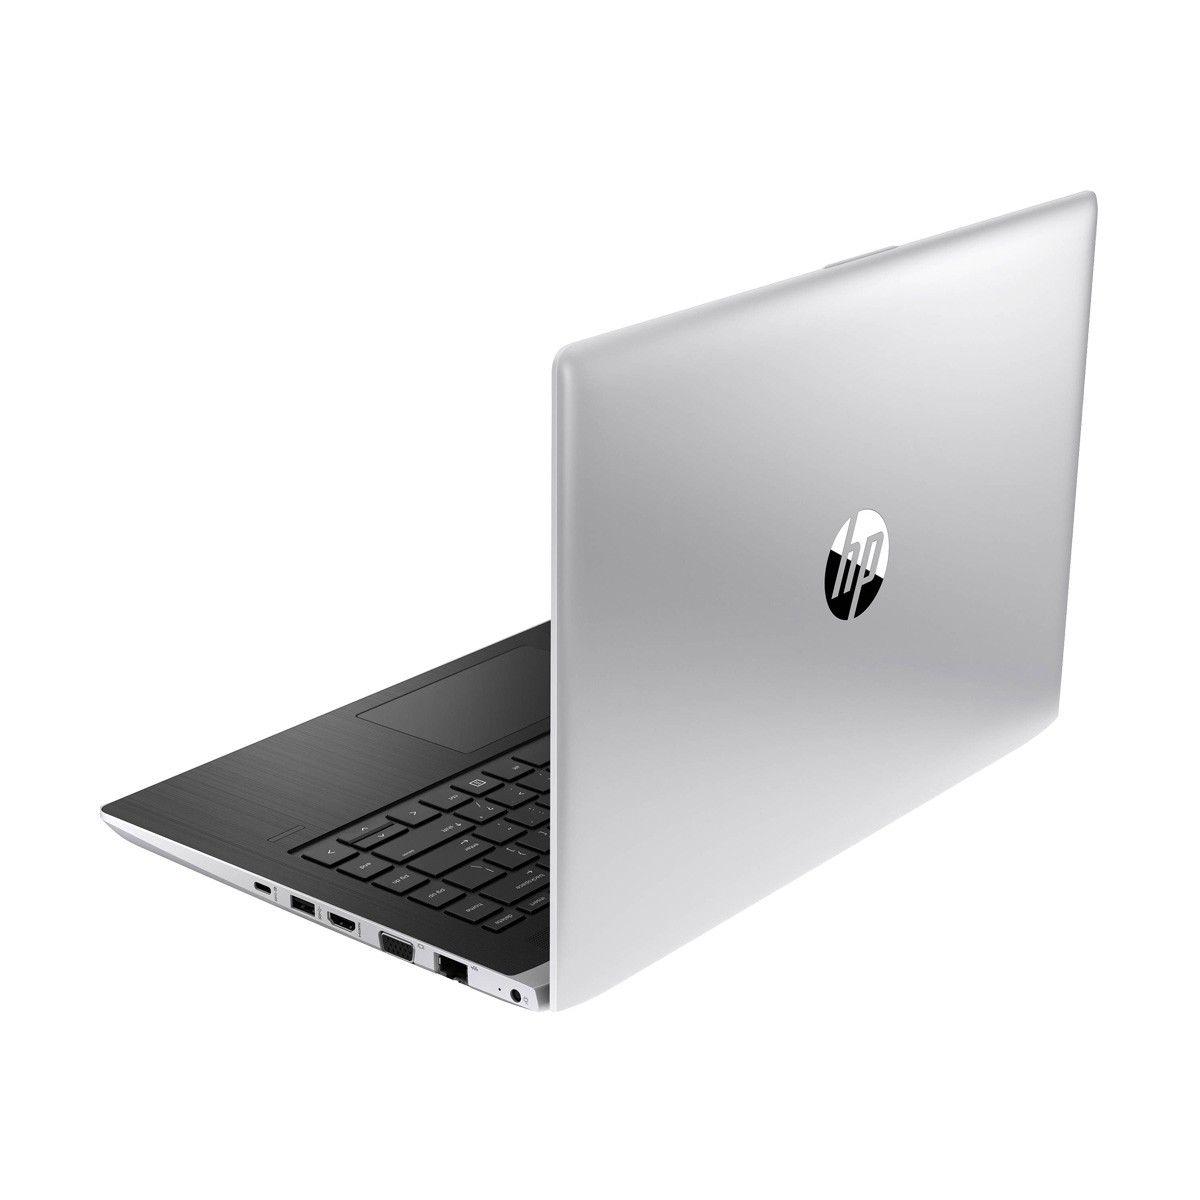 Hp Probook 450 Matte Silver Aluminum 156 Fullhd Intel Core I5 Acer E5 475g Notebook Grey 7200u 4gb Ddr4 Gt940mx 2gb Ddr5 1tb Hdd Dos 8250u Up To 34ghz 8gb Ram Geforce 930mx Graphics No Odd